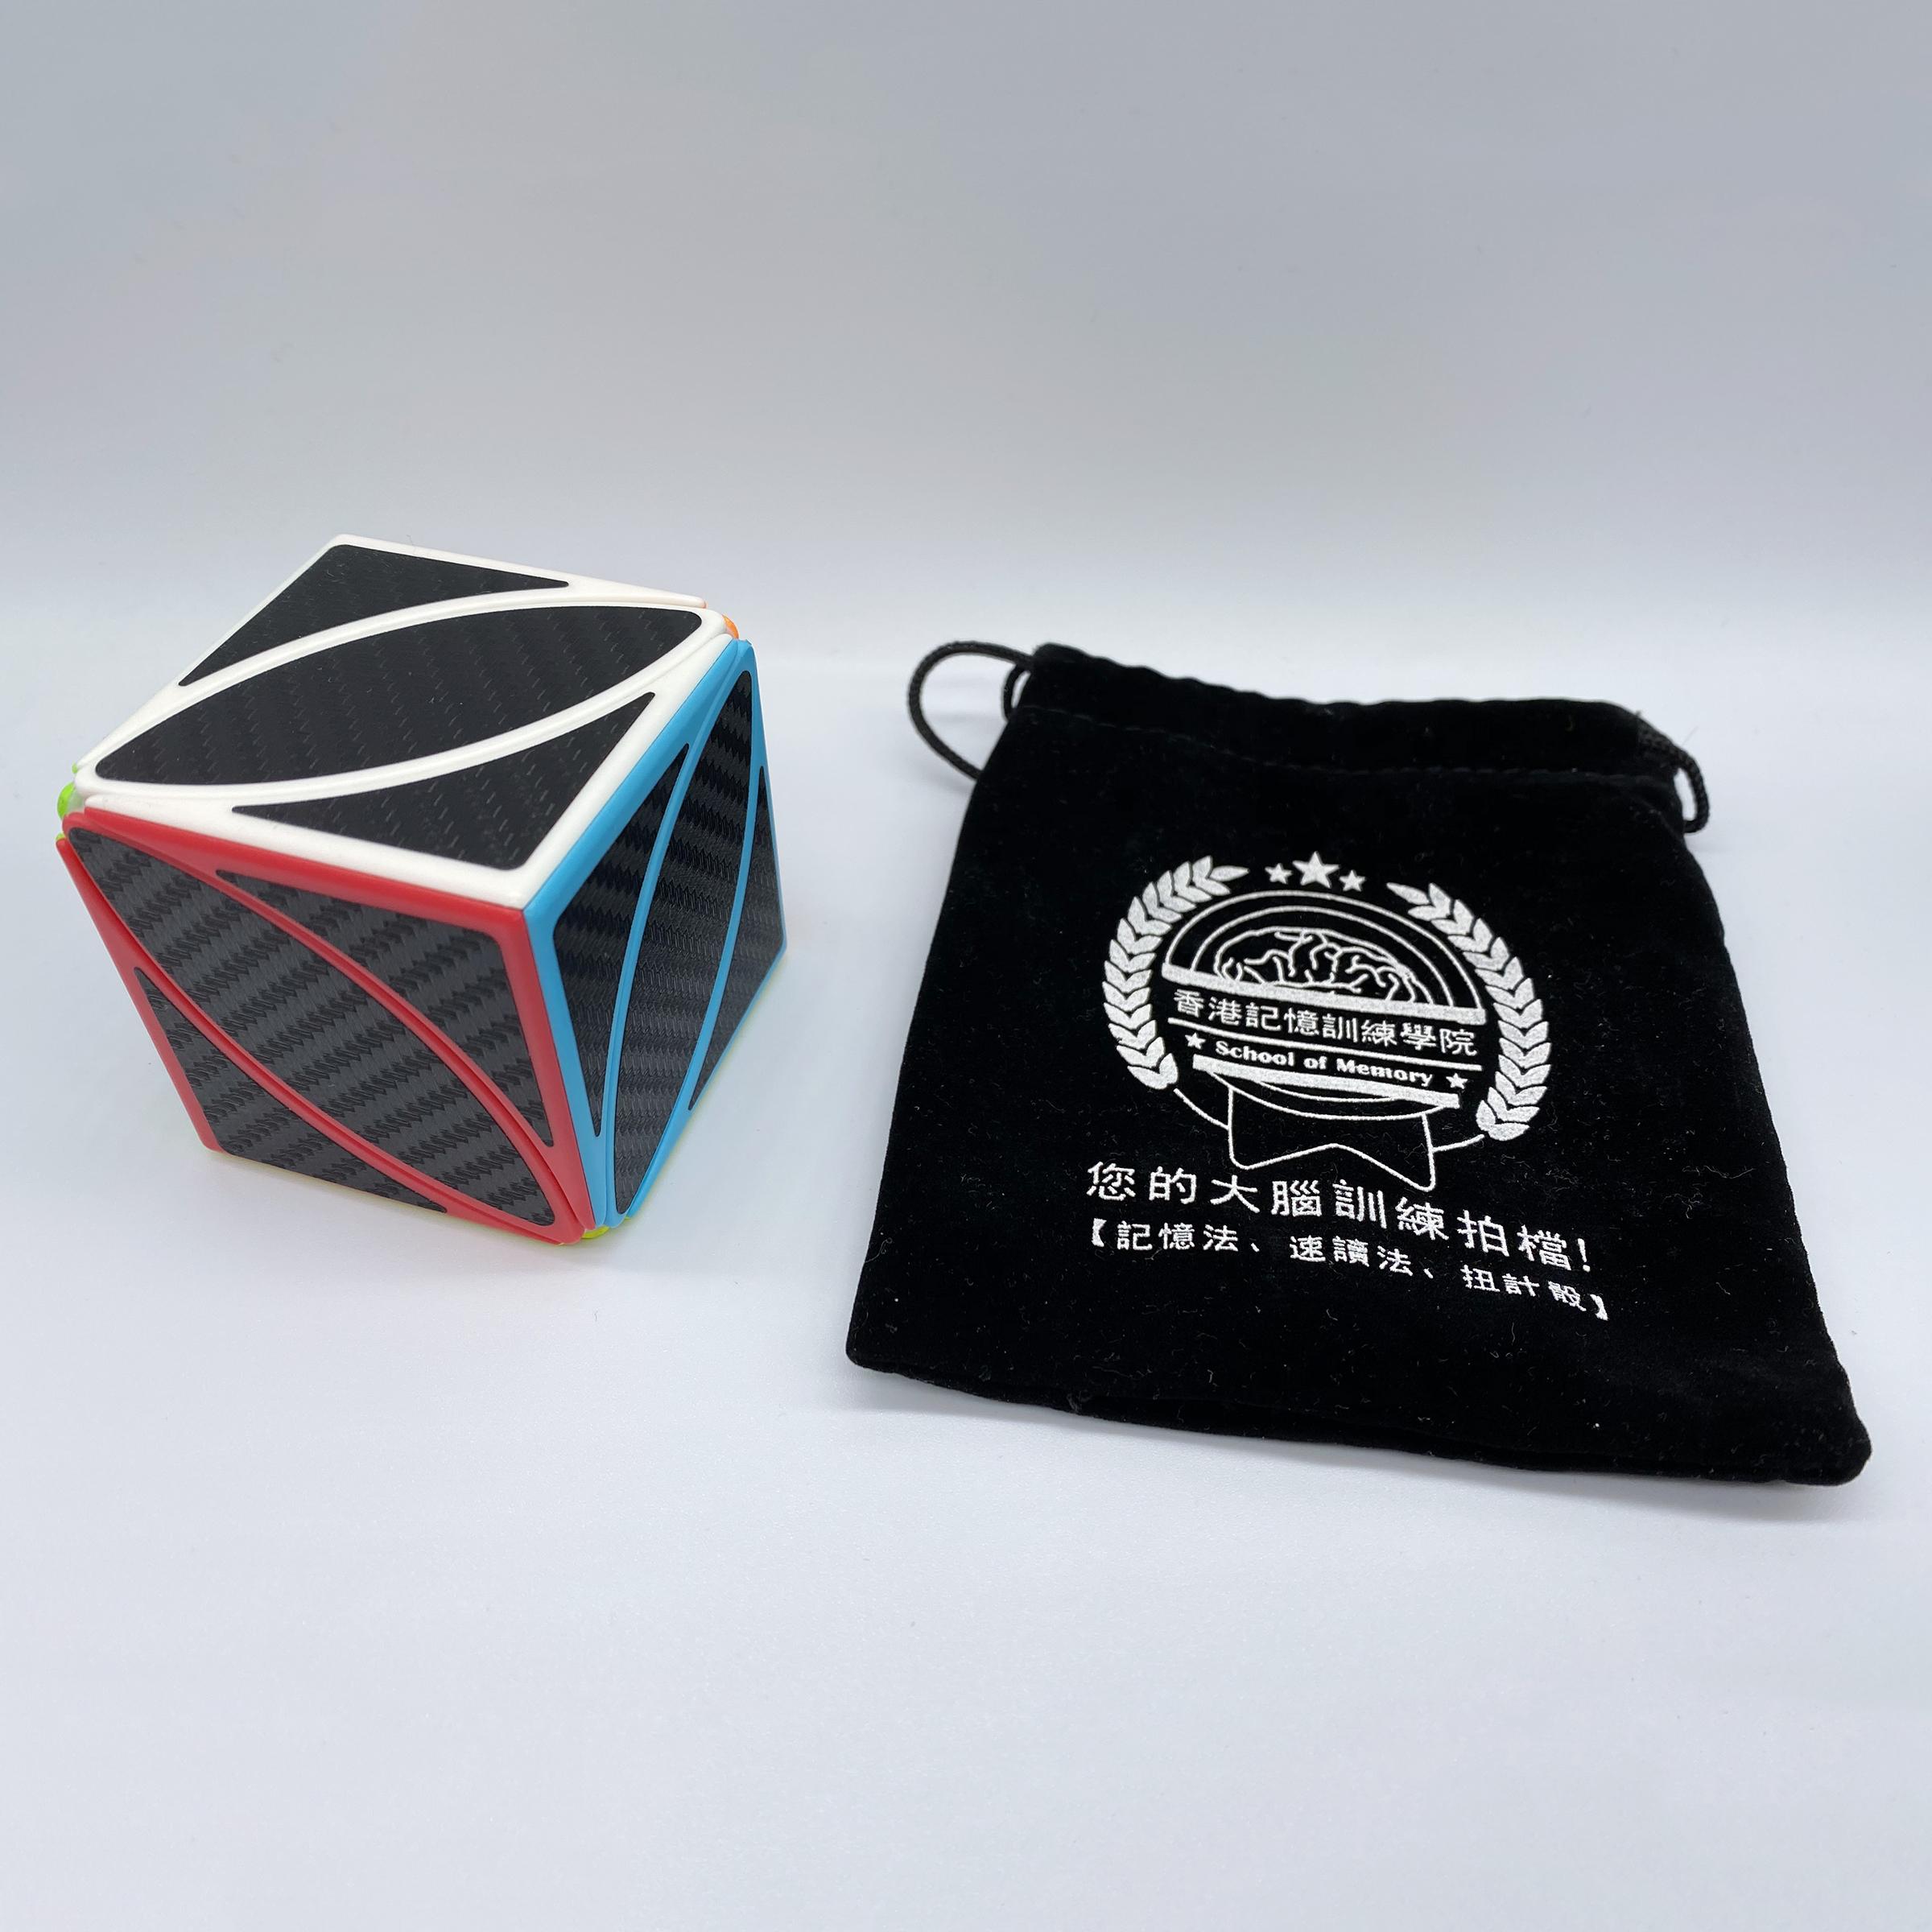 Ivy Cube 楓葉扭計骰